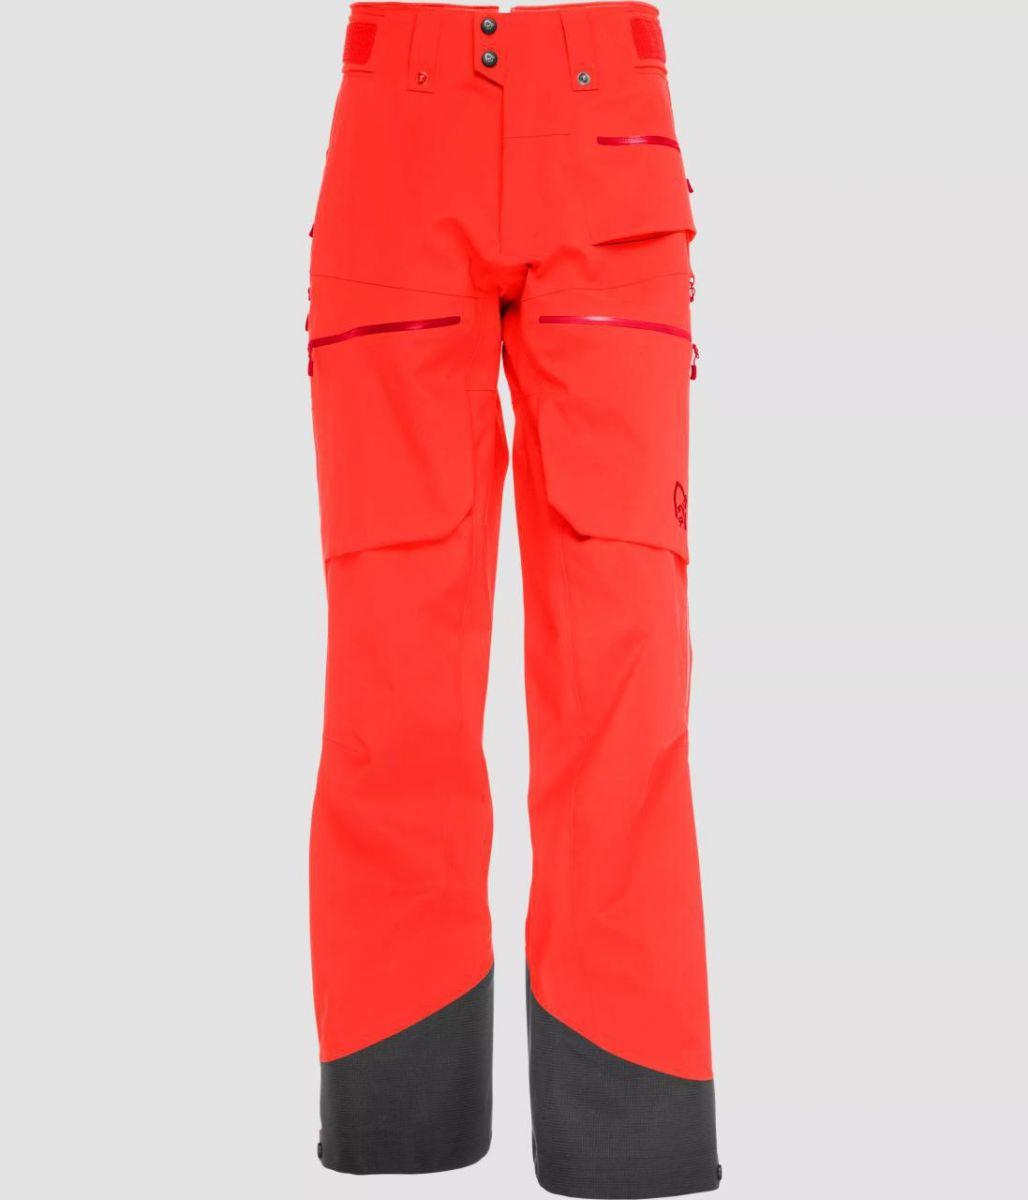 Norrona Lofoten Gore-Tex Pro pants AREDNALIN RED M